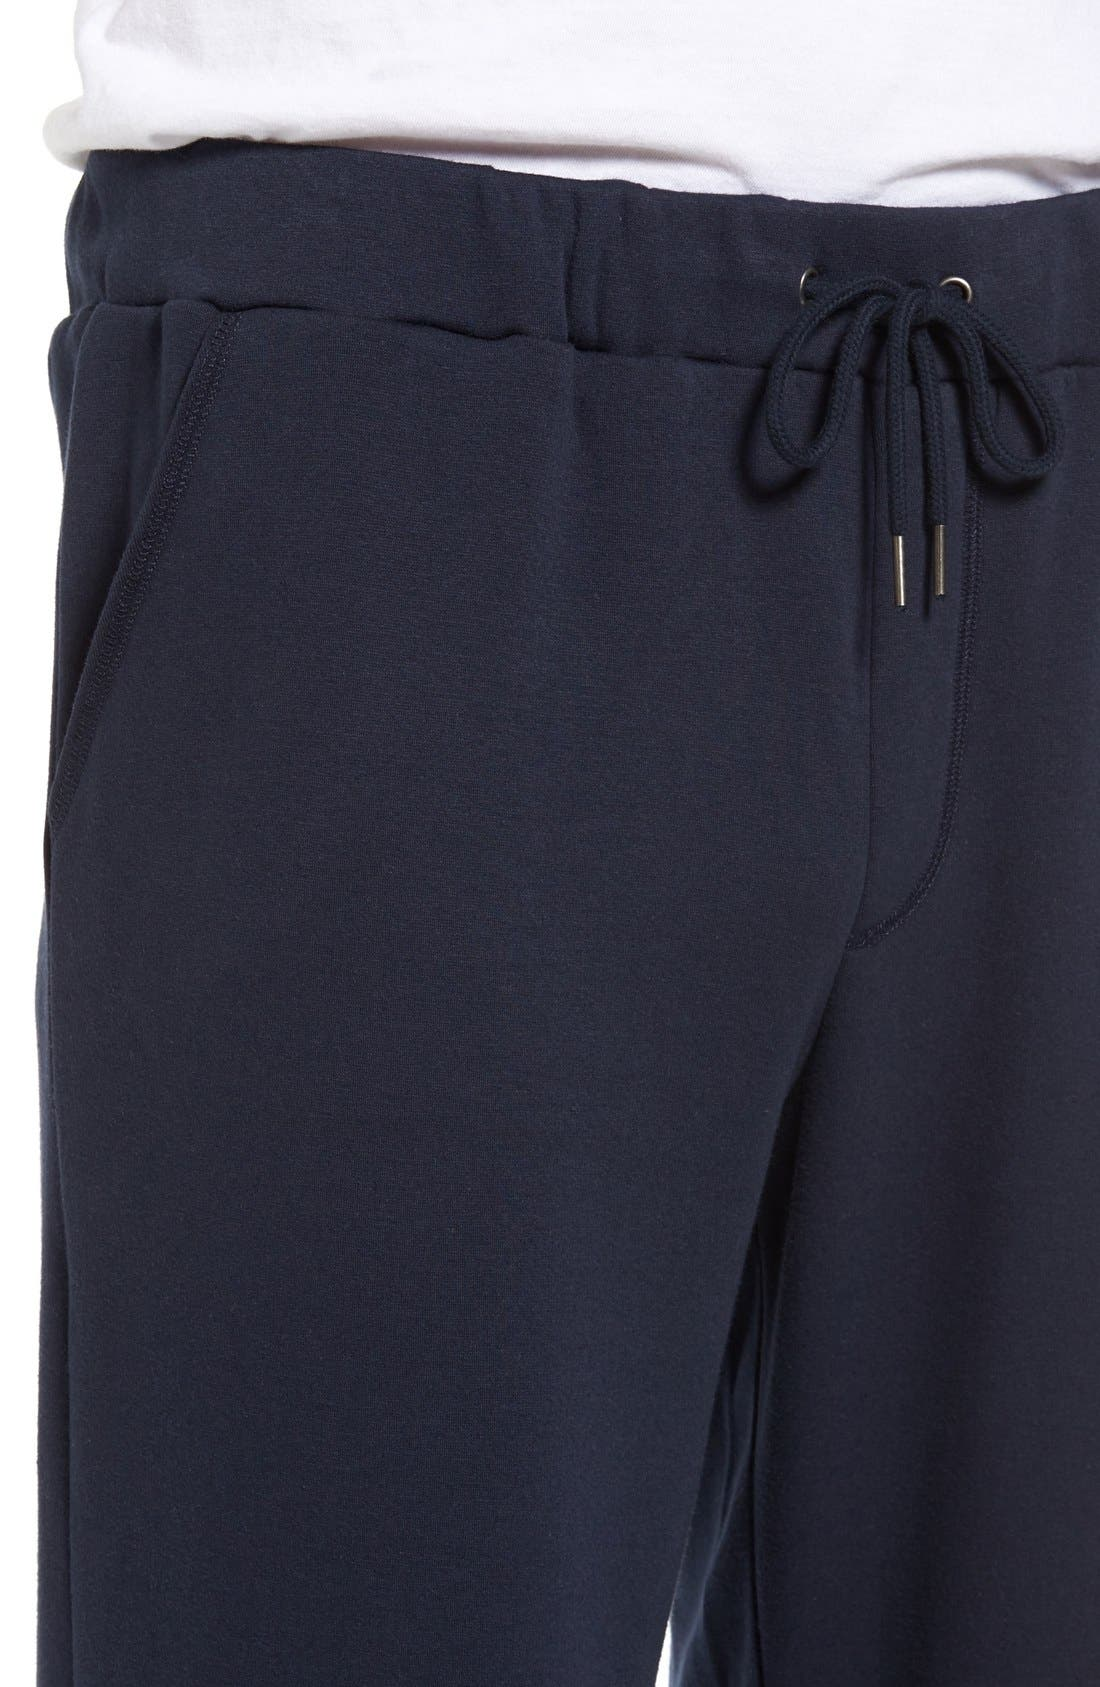 Alternate Image 4  - Nordstrom Men's Shop Fleece Lounge Pants